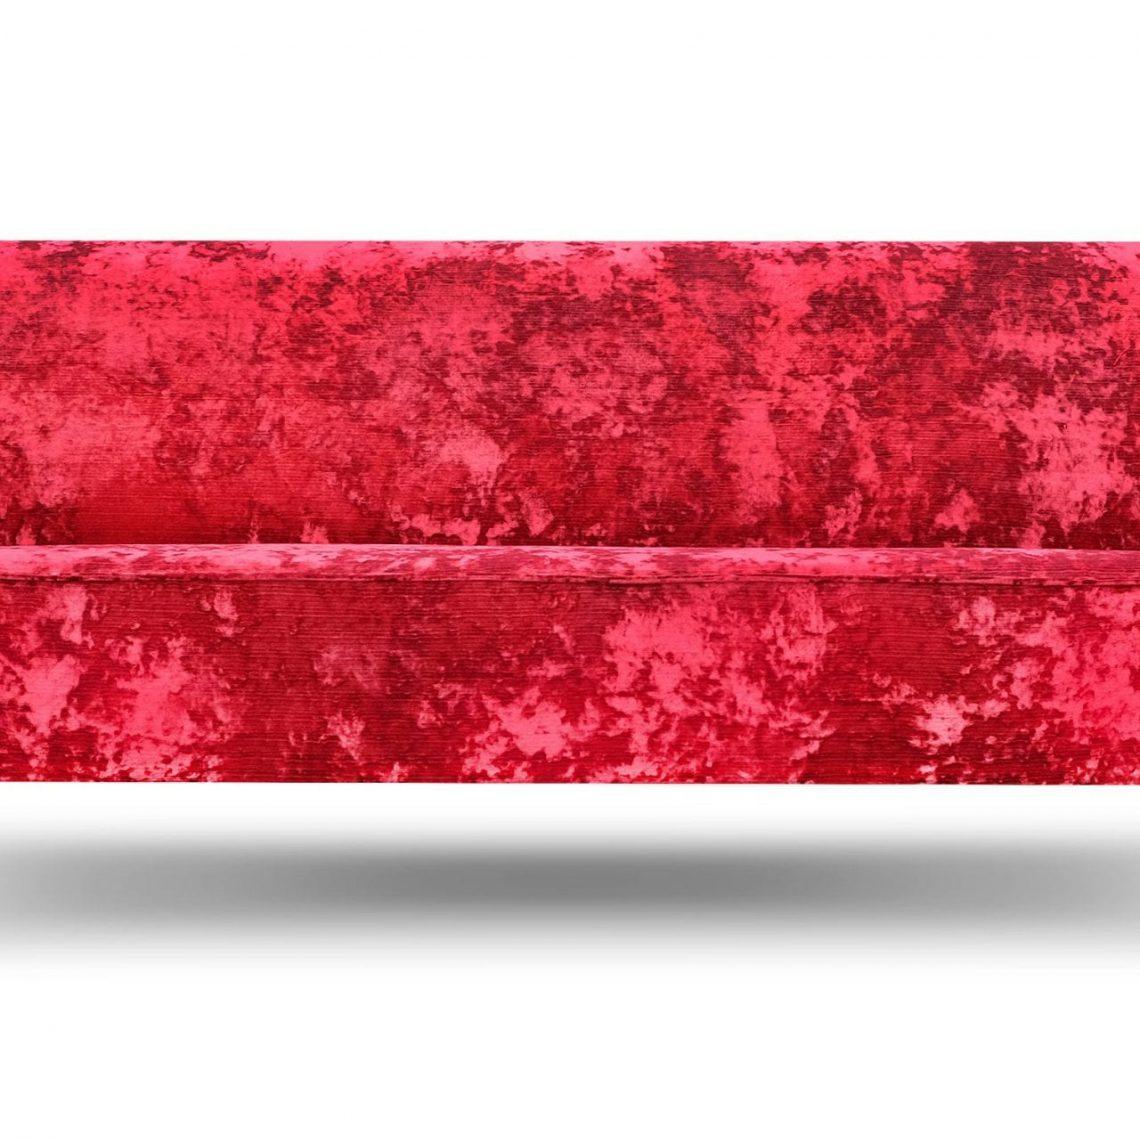 De klassieke Rookery bank in de verbluffende stof Argento rasberry